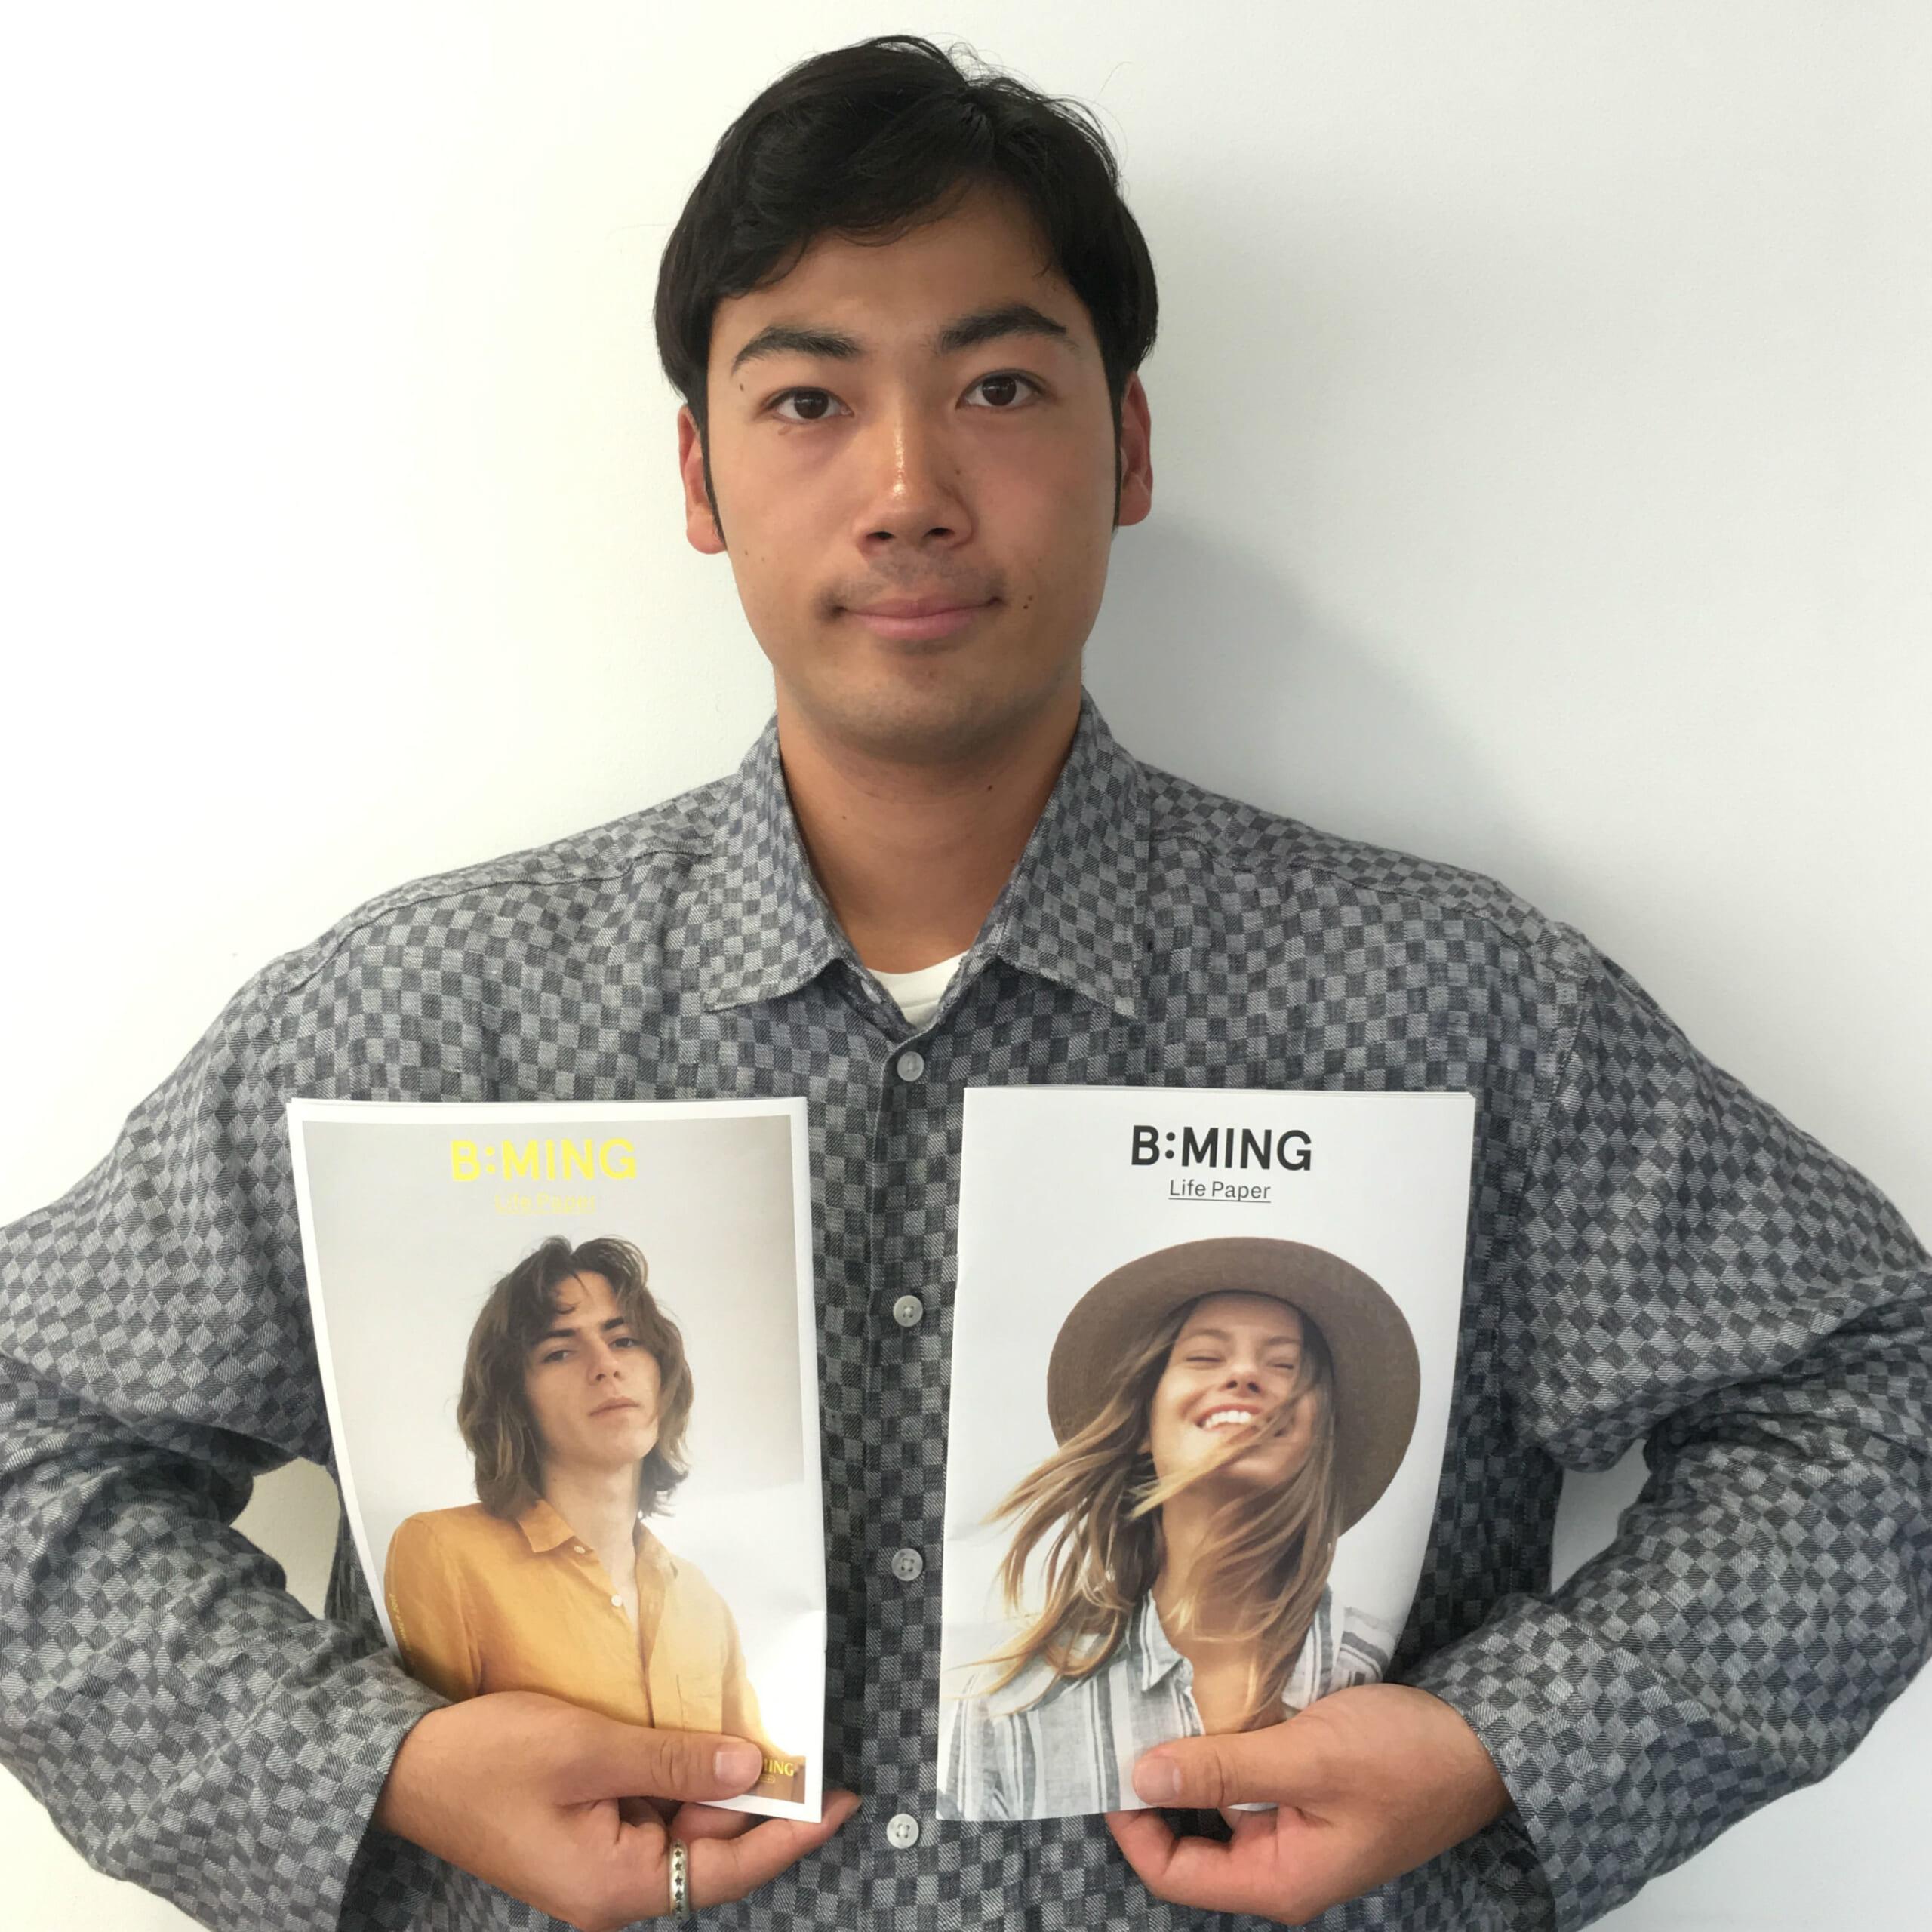 B:MING by BEAMSより一足先に夏の空気をお届け!